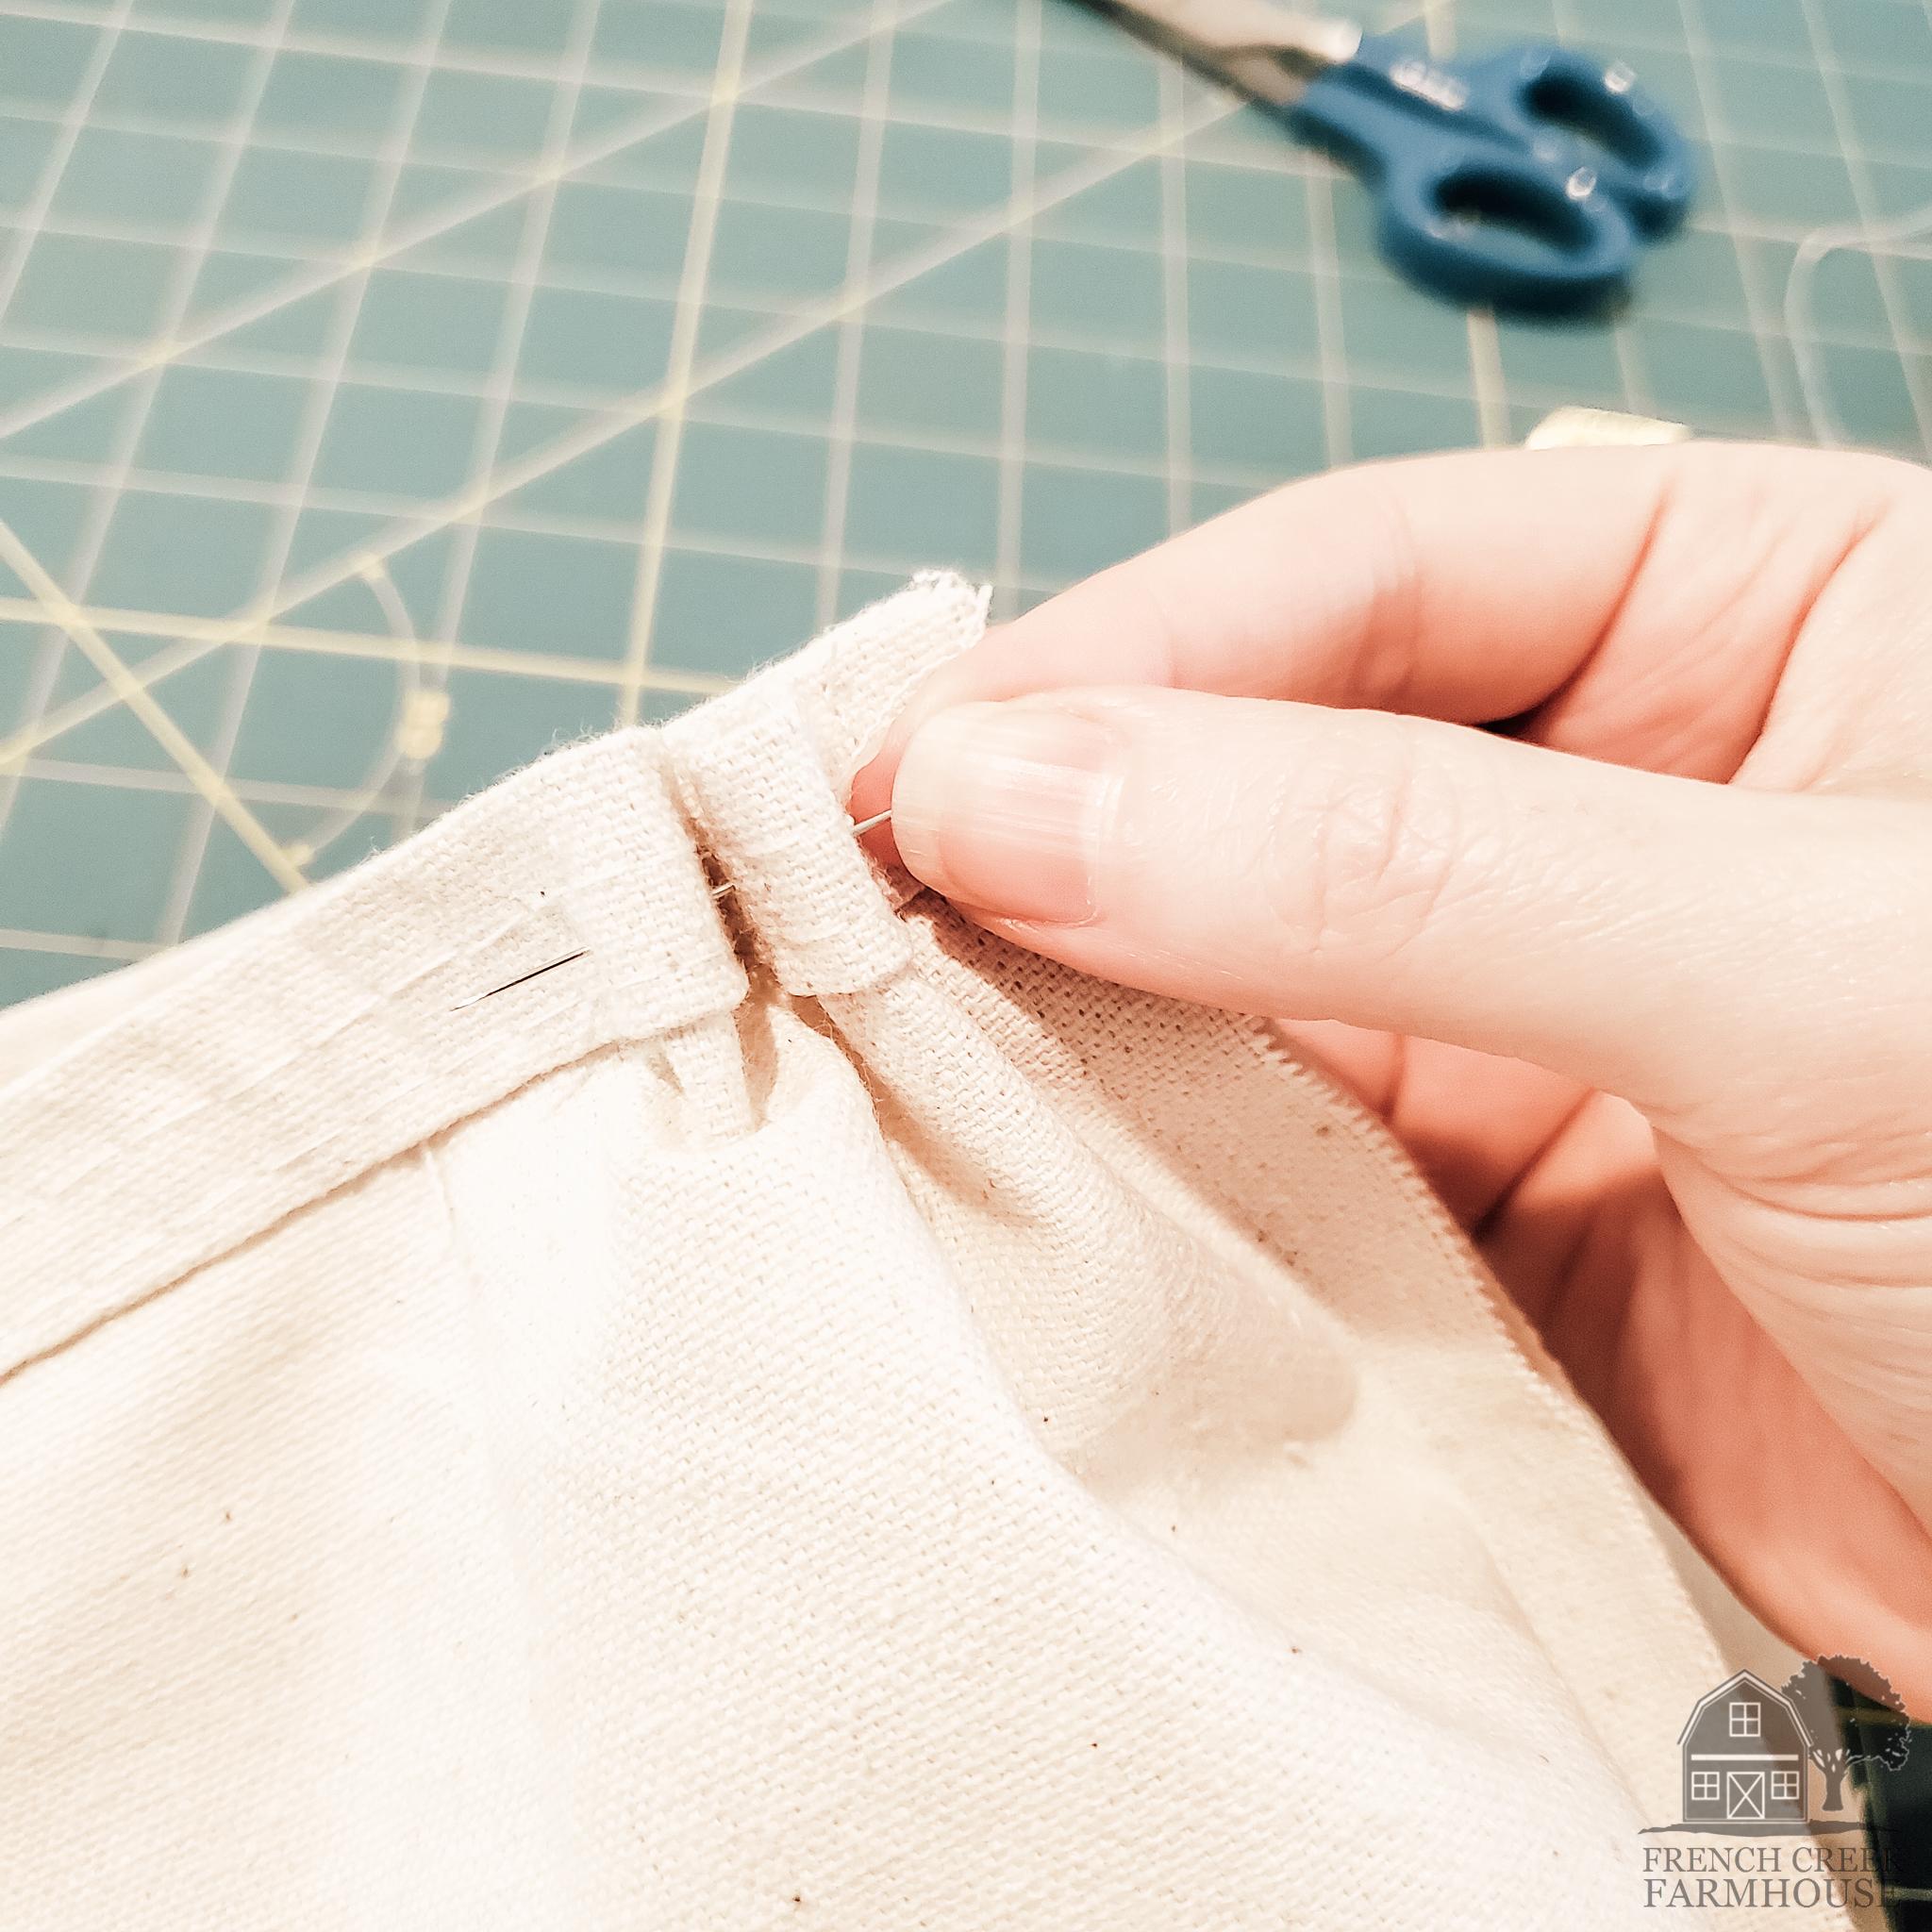 Sew a gathering stitch around the pumpkin